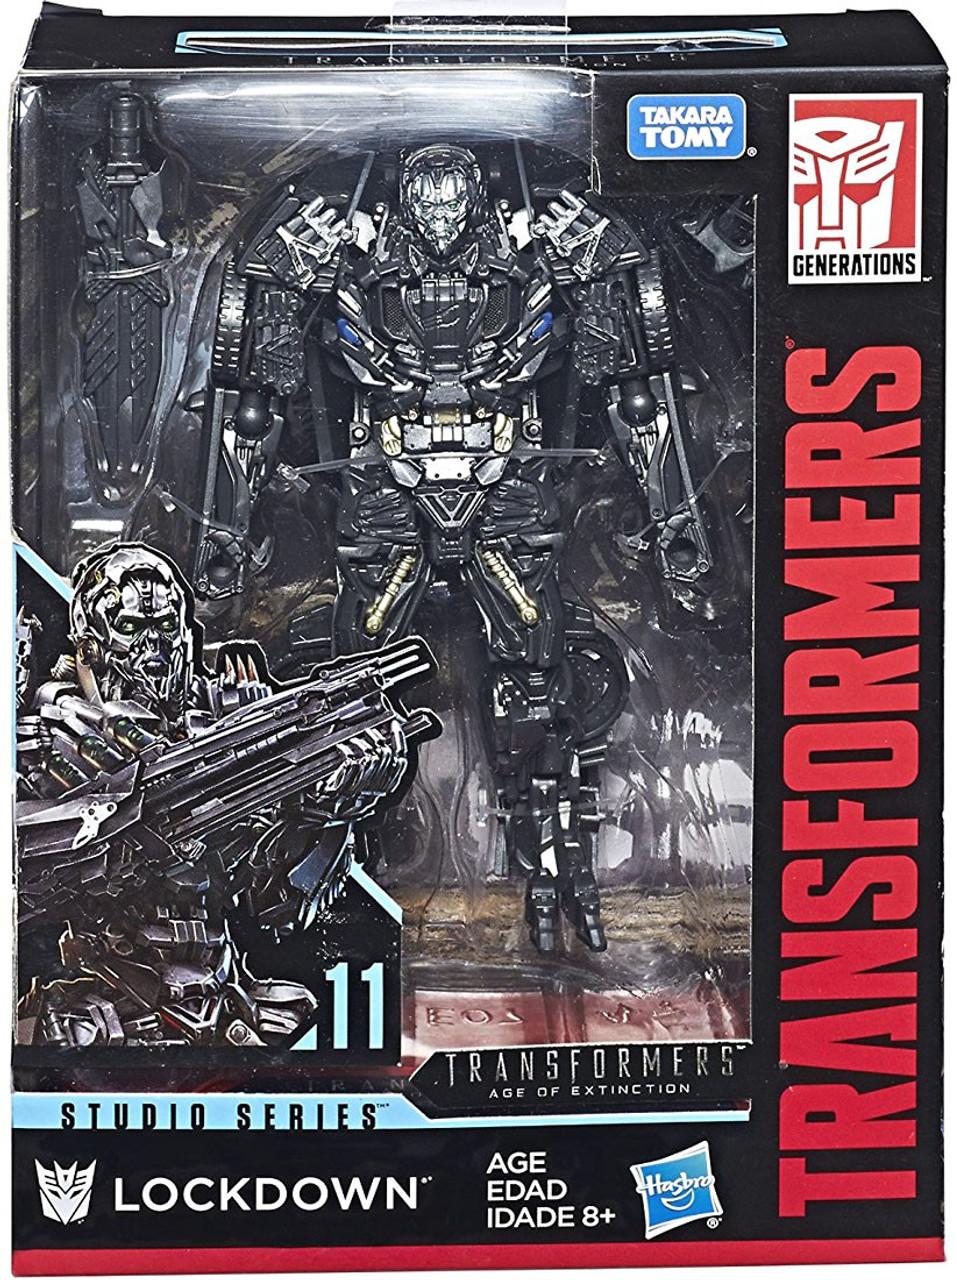 Transformers Generations Studio Series Lockdown Deluxe Action Figure 11 Hasbro Toys Toywiz